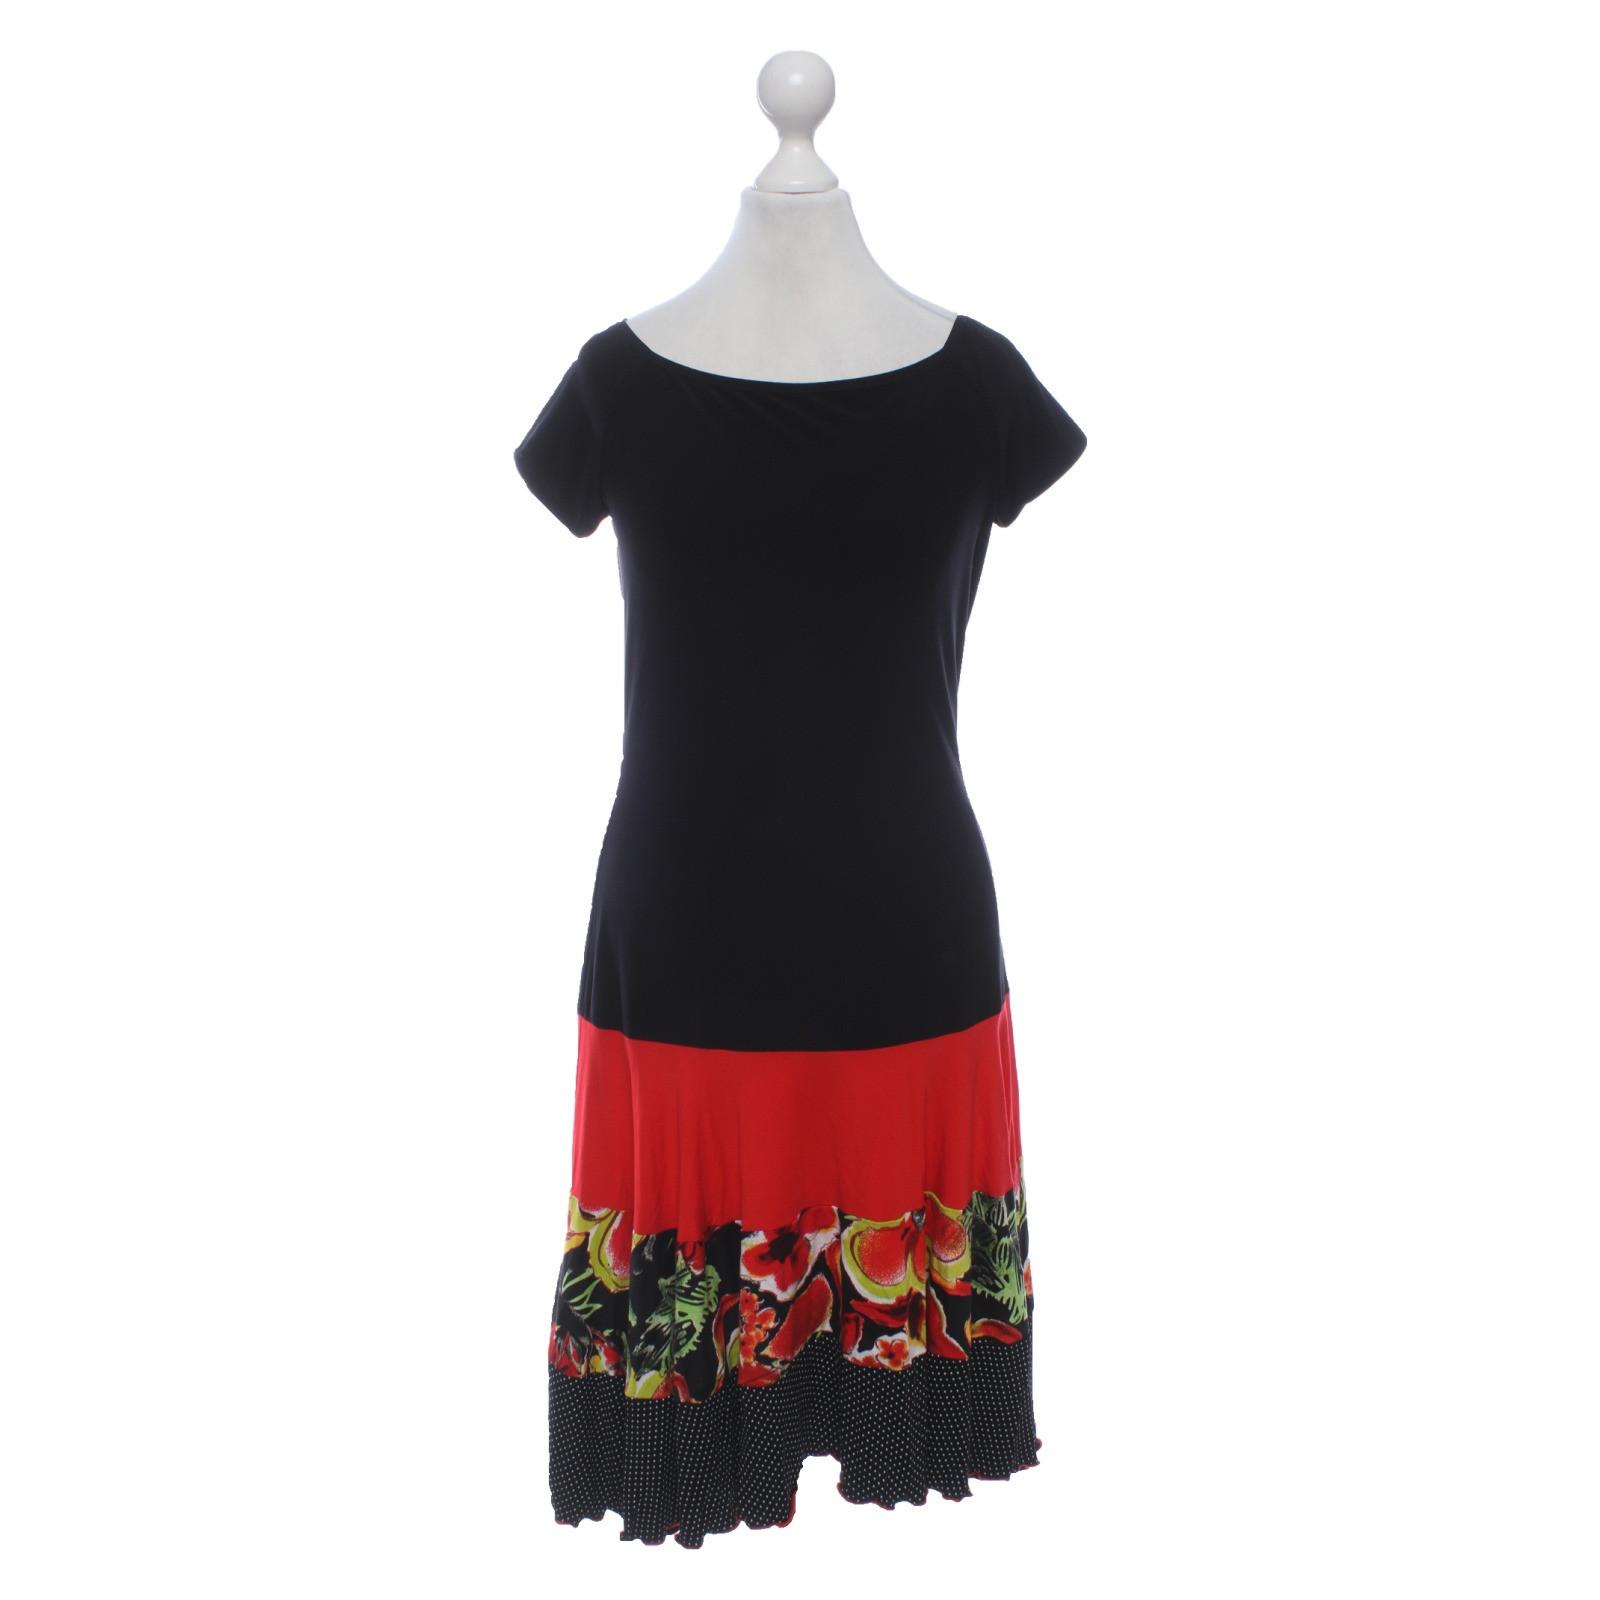 Joseph Ribkoff Kleid aus Jersey - Second Hand Joseph Ribkoff Kleid